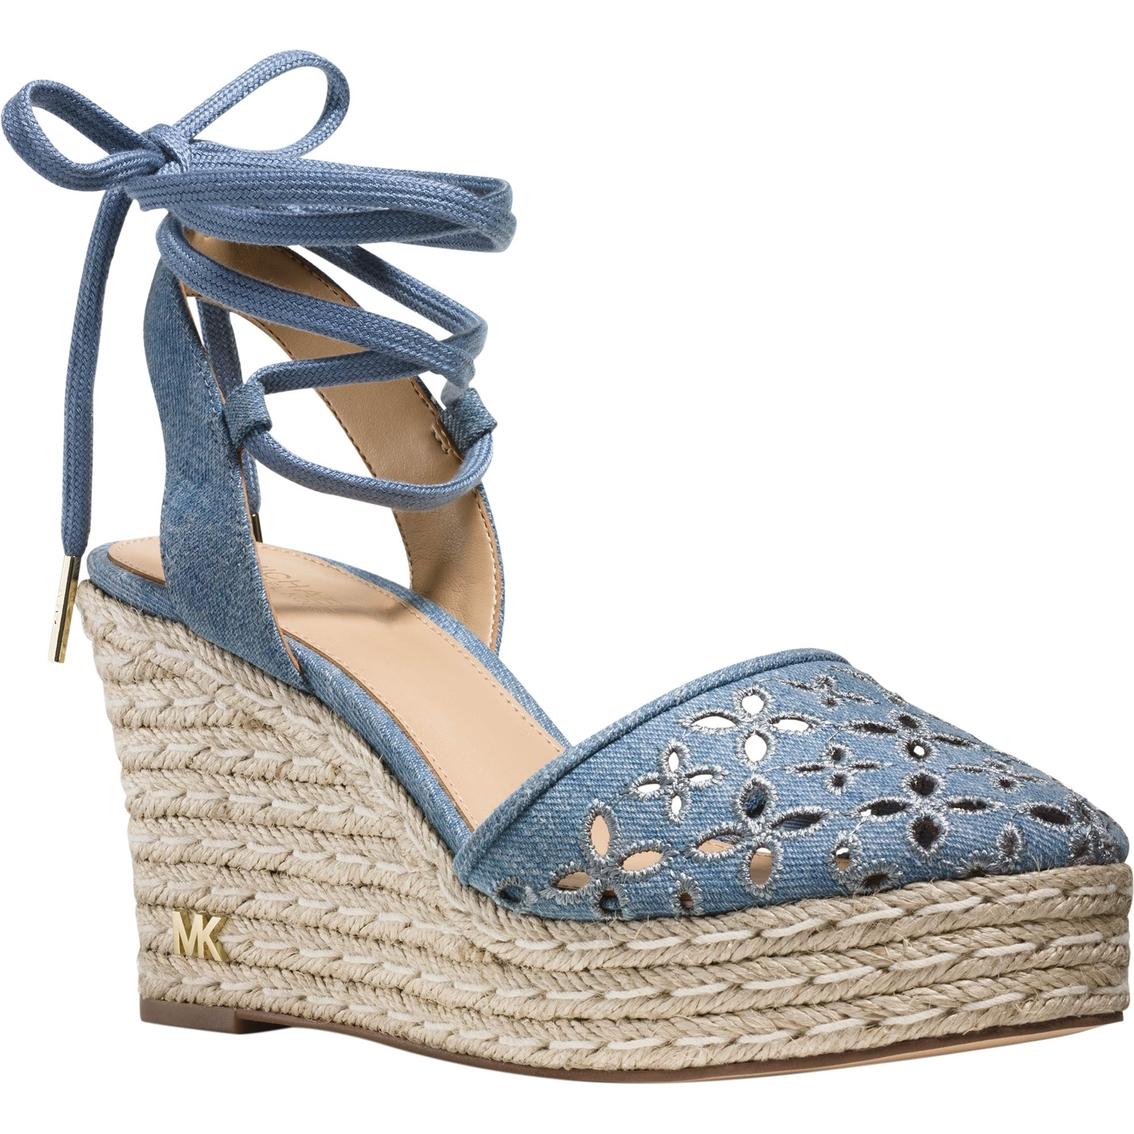 Michael Kors Darci Closed Toe Wedges Wedge Shoes